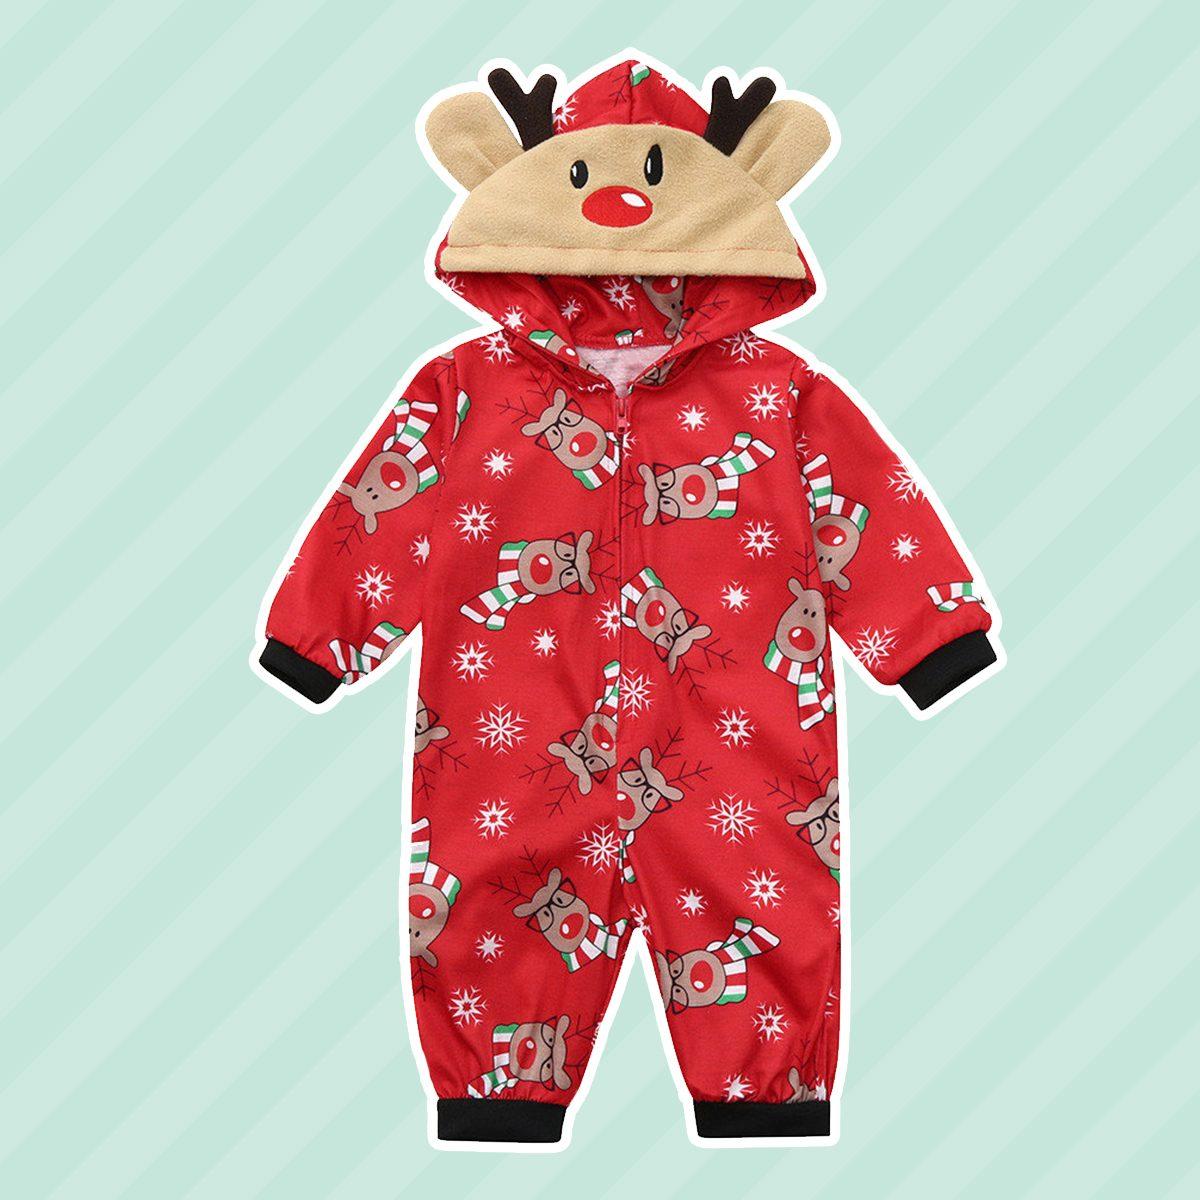 Baby Christmas Costume | Baby Santa Costume | Toddler Christmas Costume | Baby Girl Costume | Baby Christmas Outfit | Baby Boy Christmas